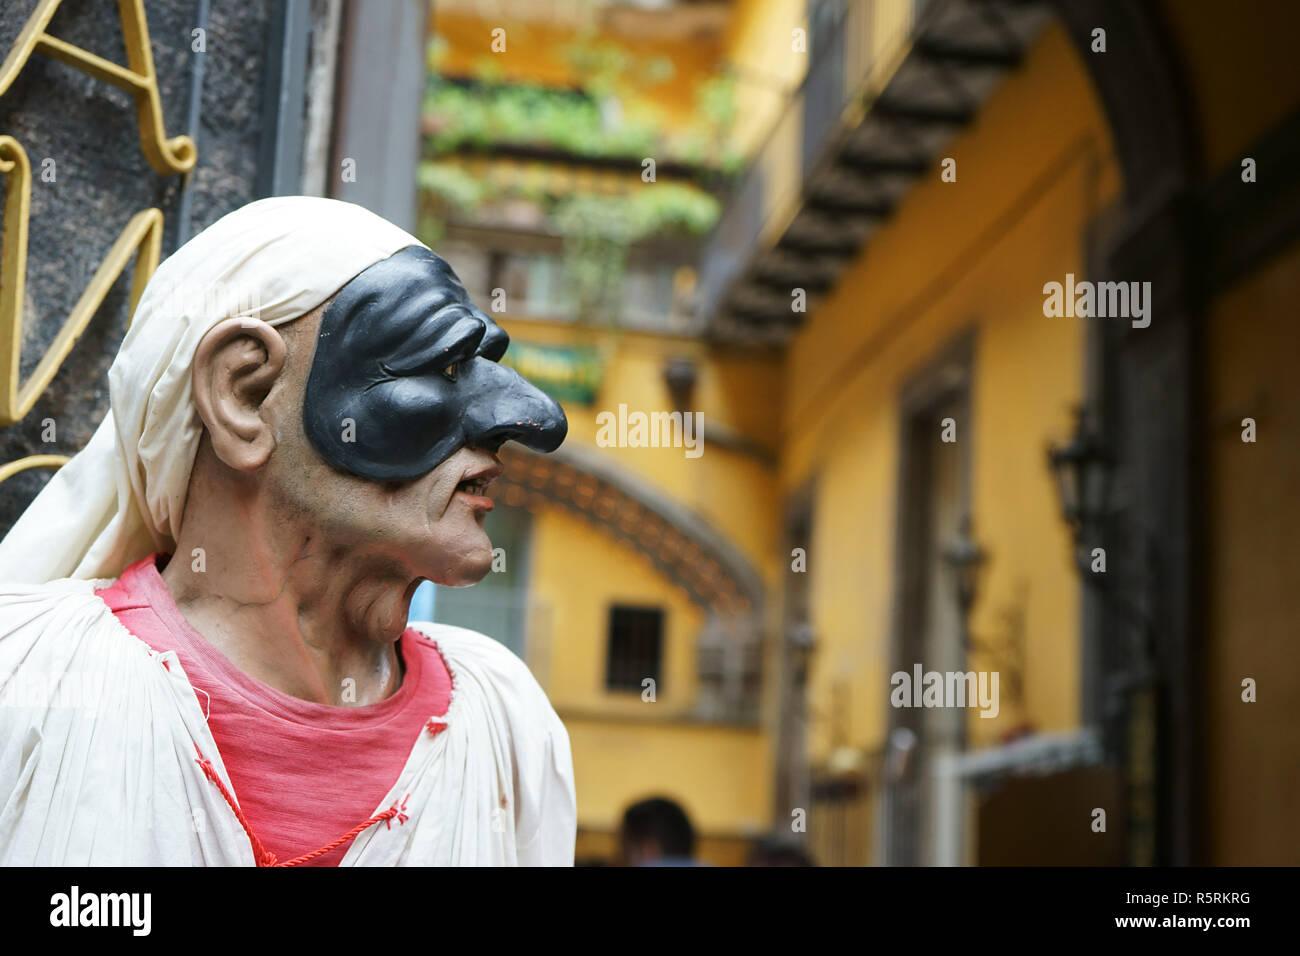 Pulcinella traditional neapolitan mask, in Via San Gregorio Armeno, historic center of Naples, Italy - Stock Image